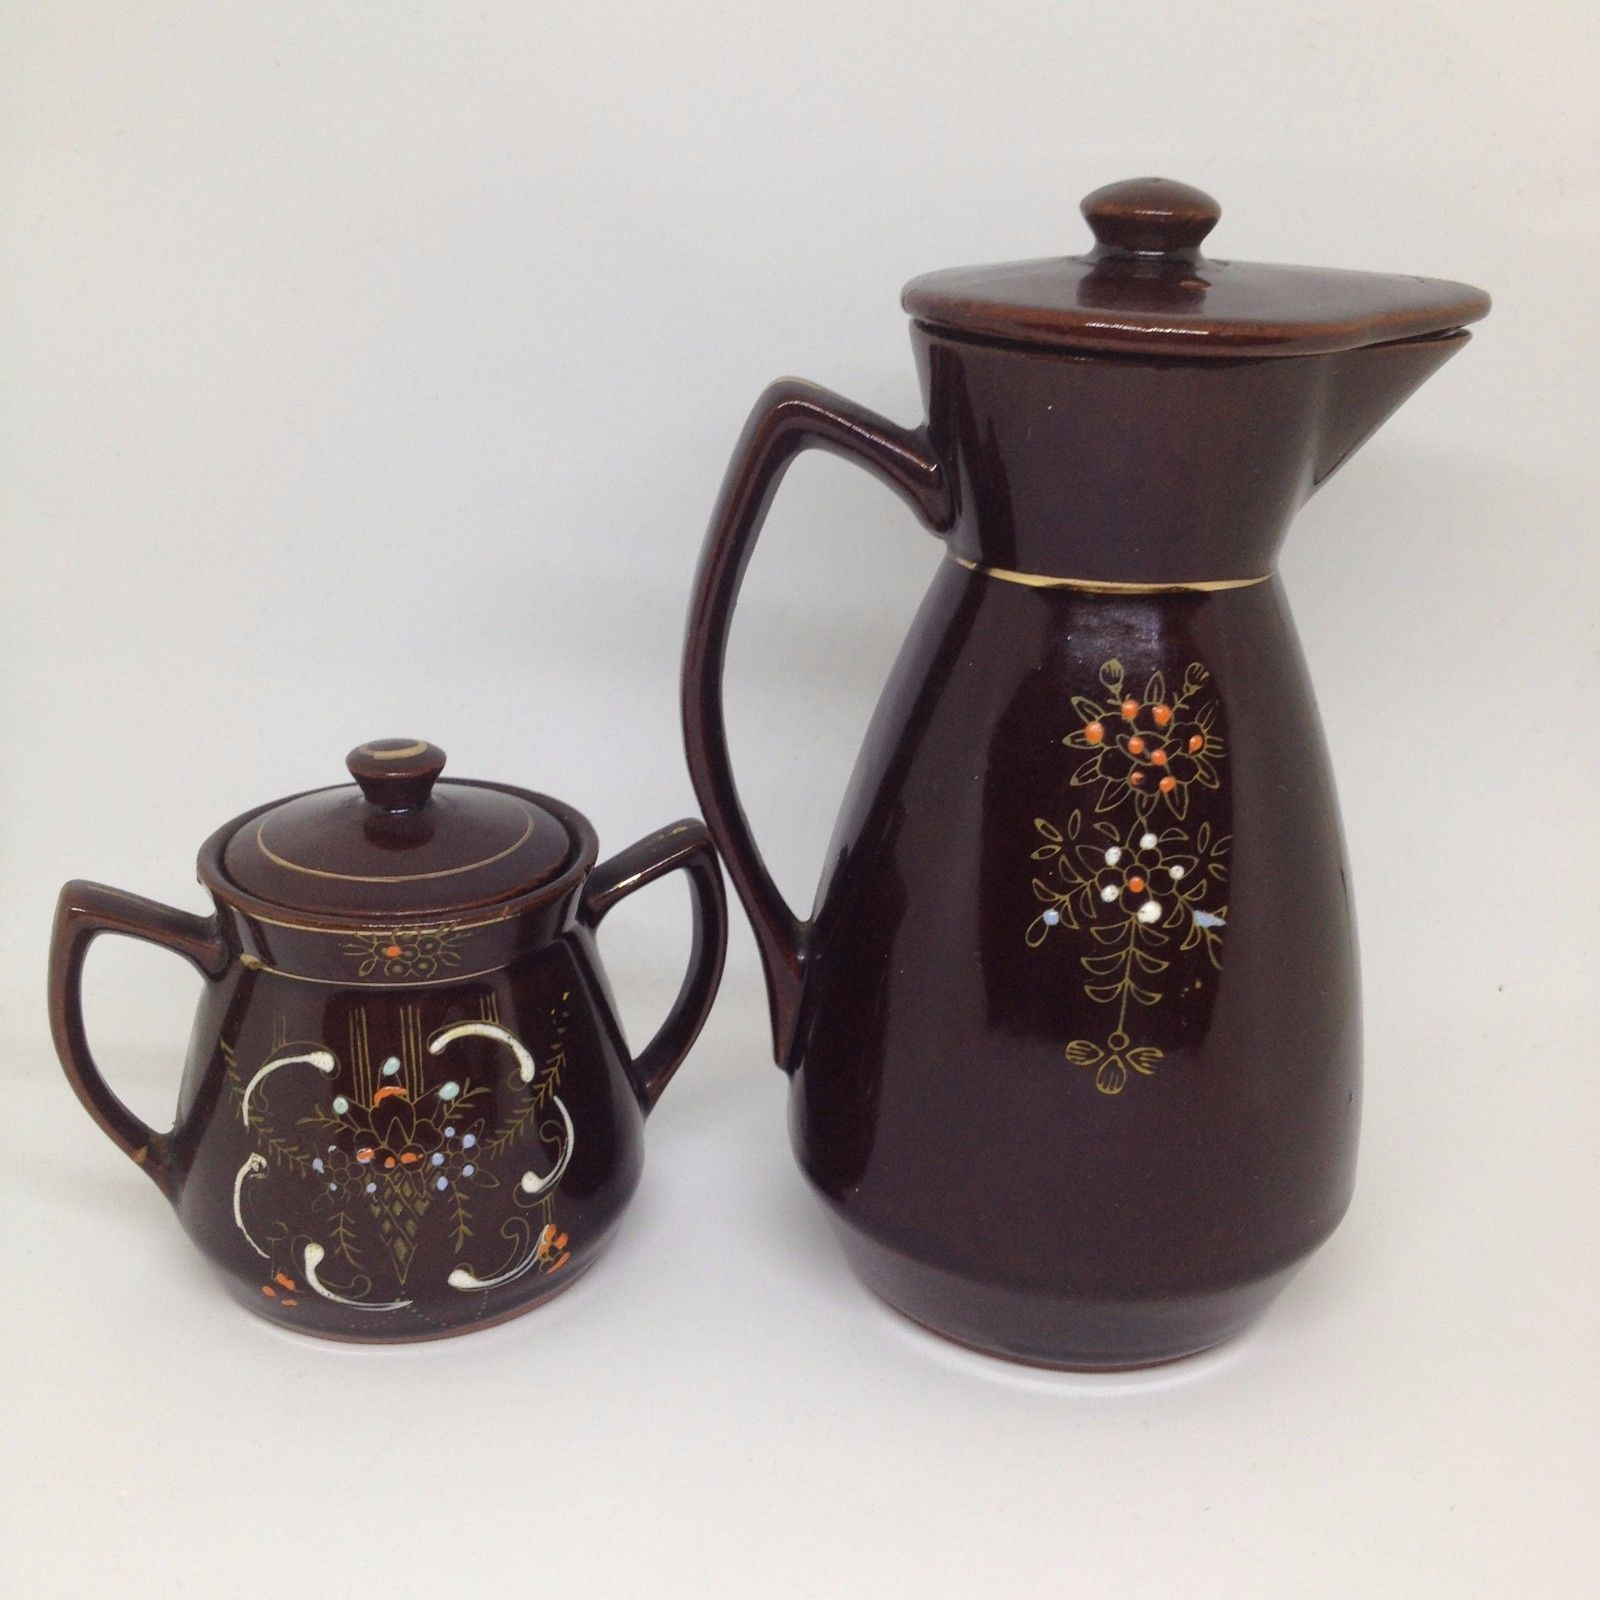 VTG Mid Century Japan Set Brown Orange Coffee Creamer & Sugar Bowl Hand Painted?